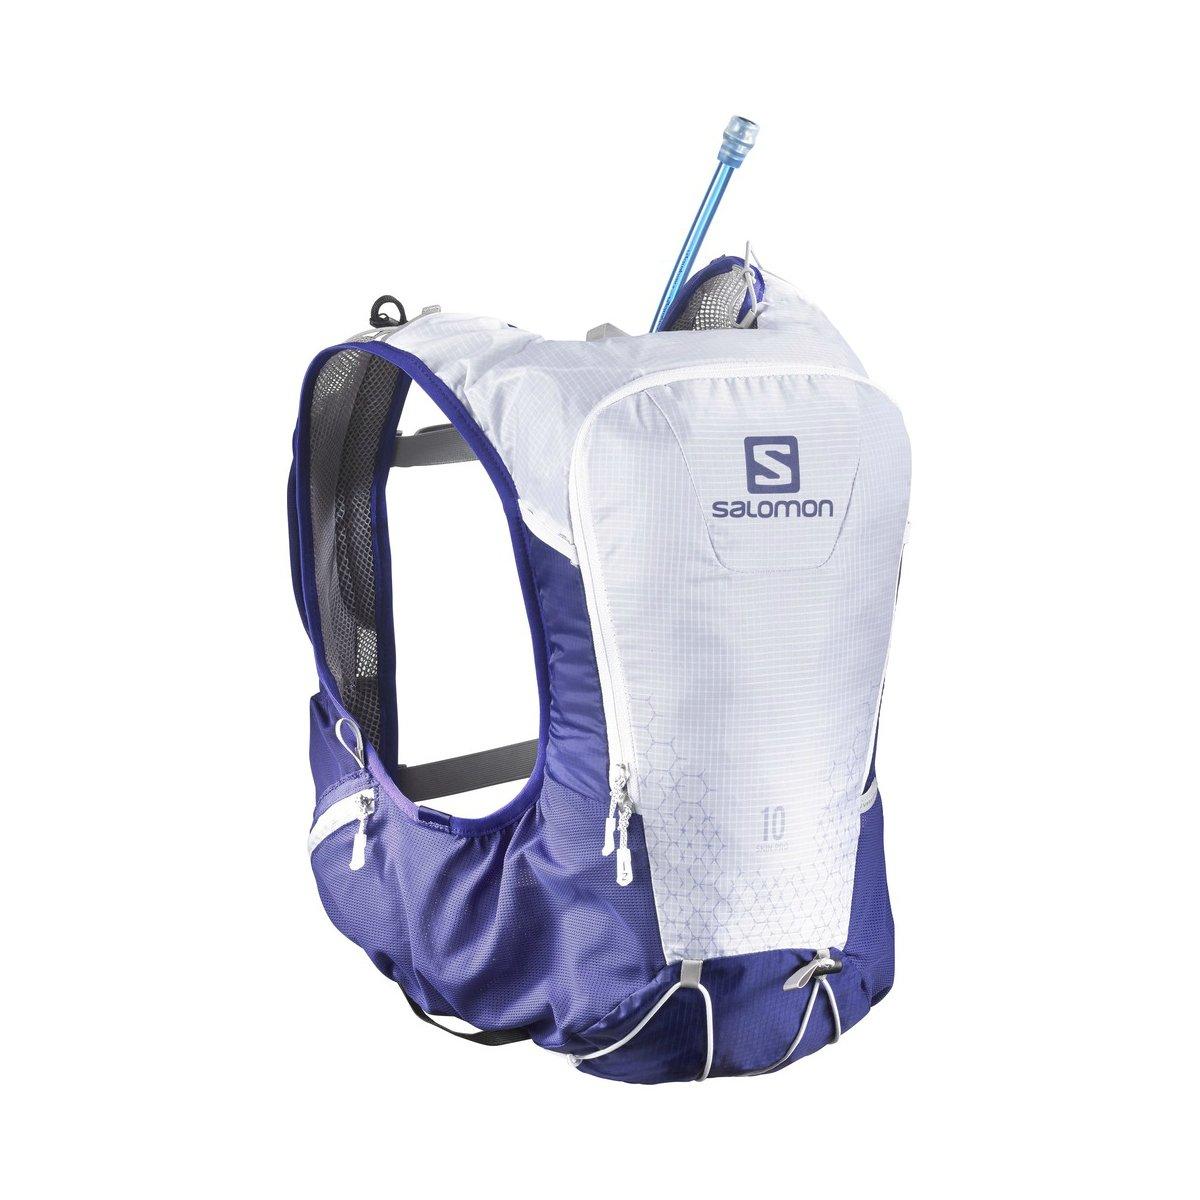 f9003f2c8e Batoh Salomon Skin Pro 15 Set L37996200 - Actisport.cz